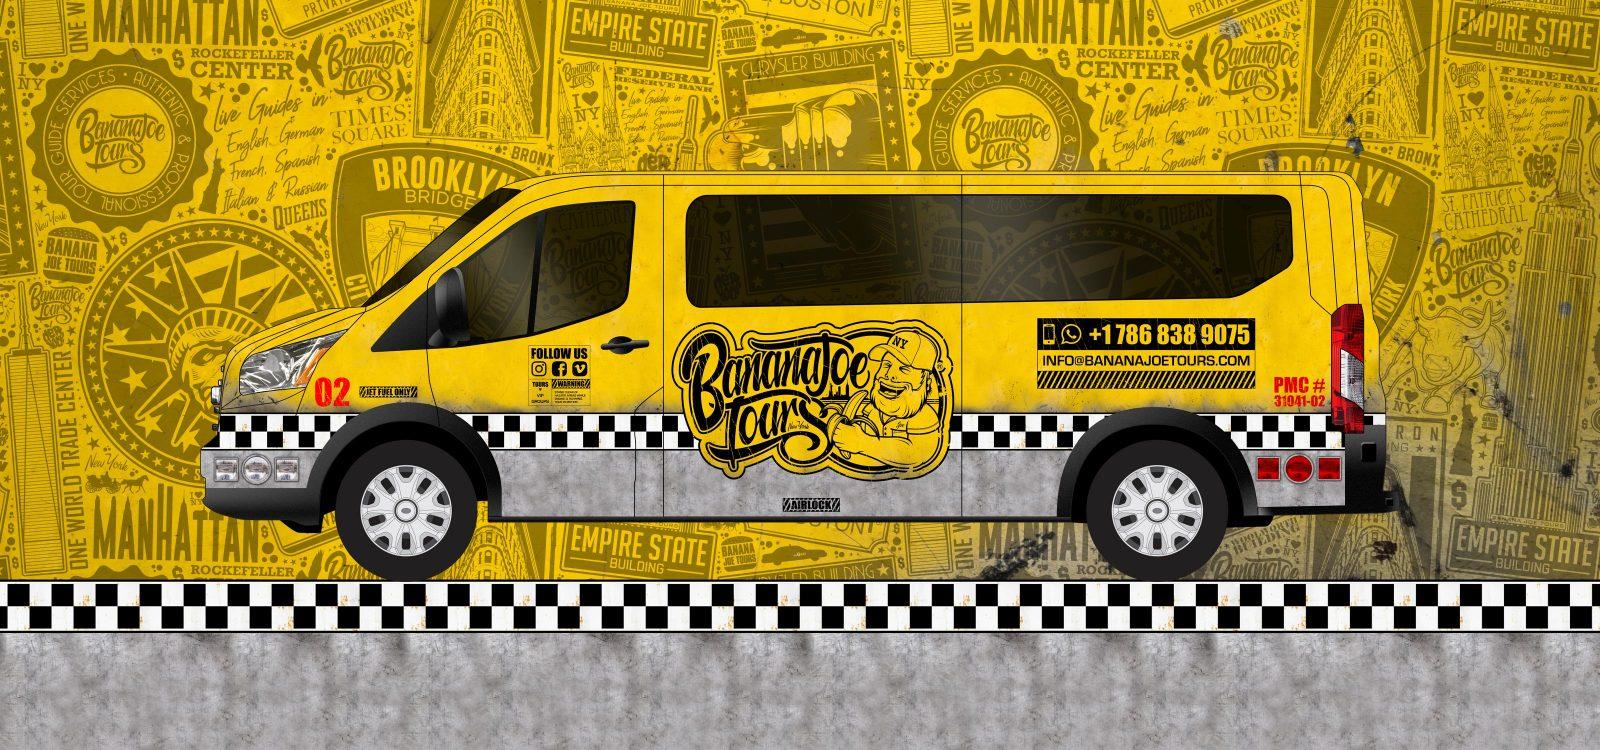 banana-joe-tours-new-york-vans